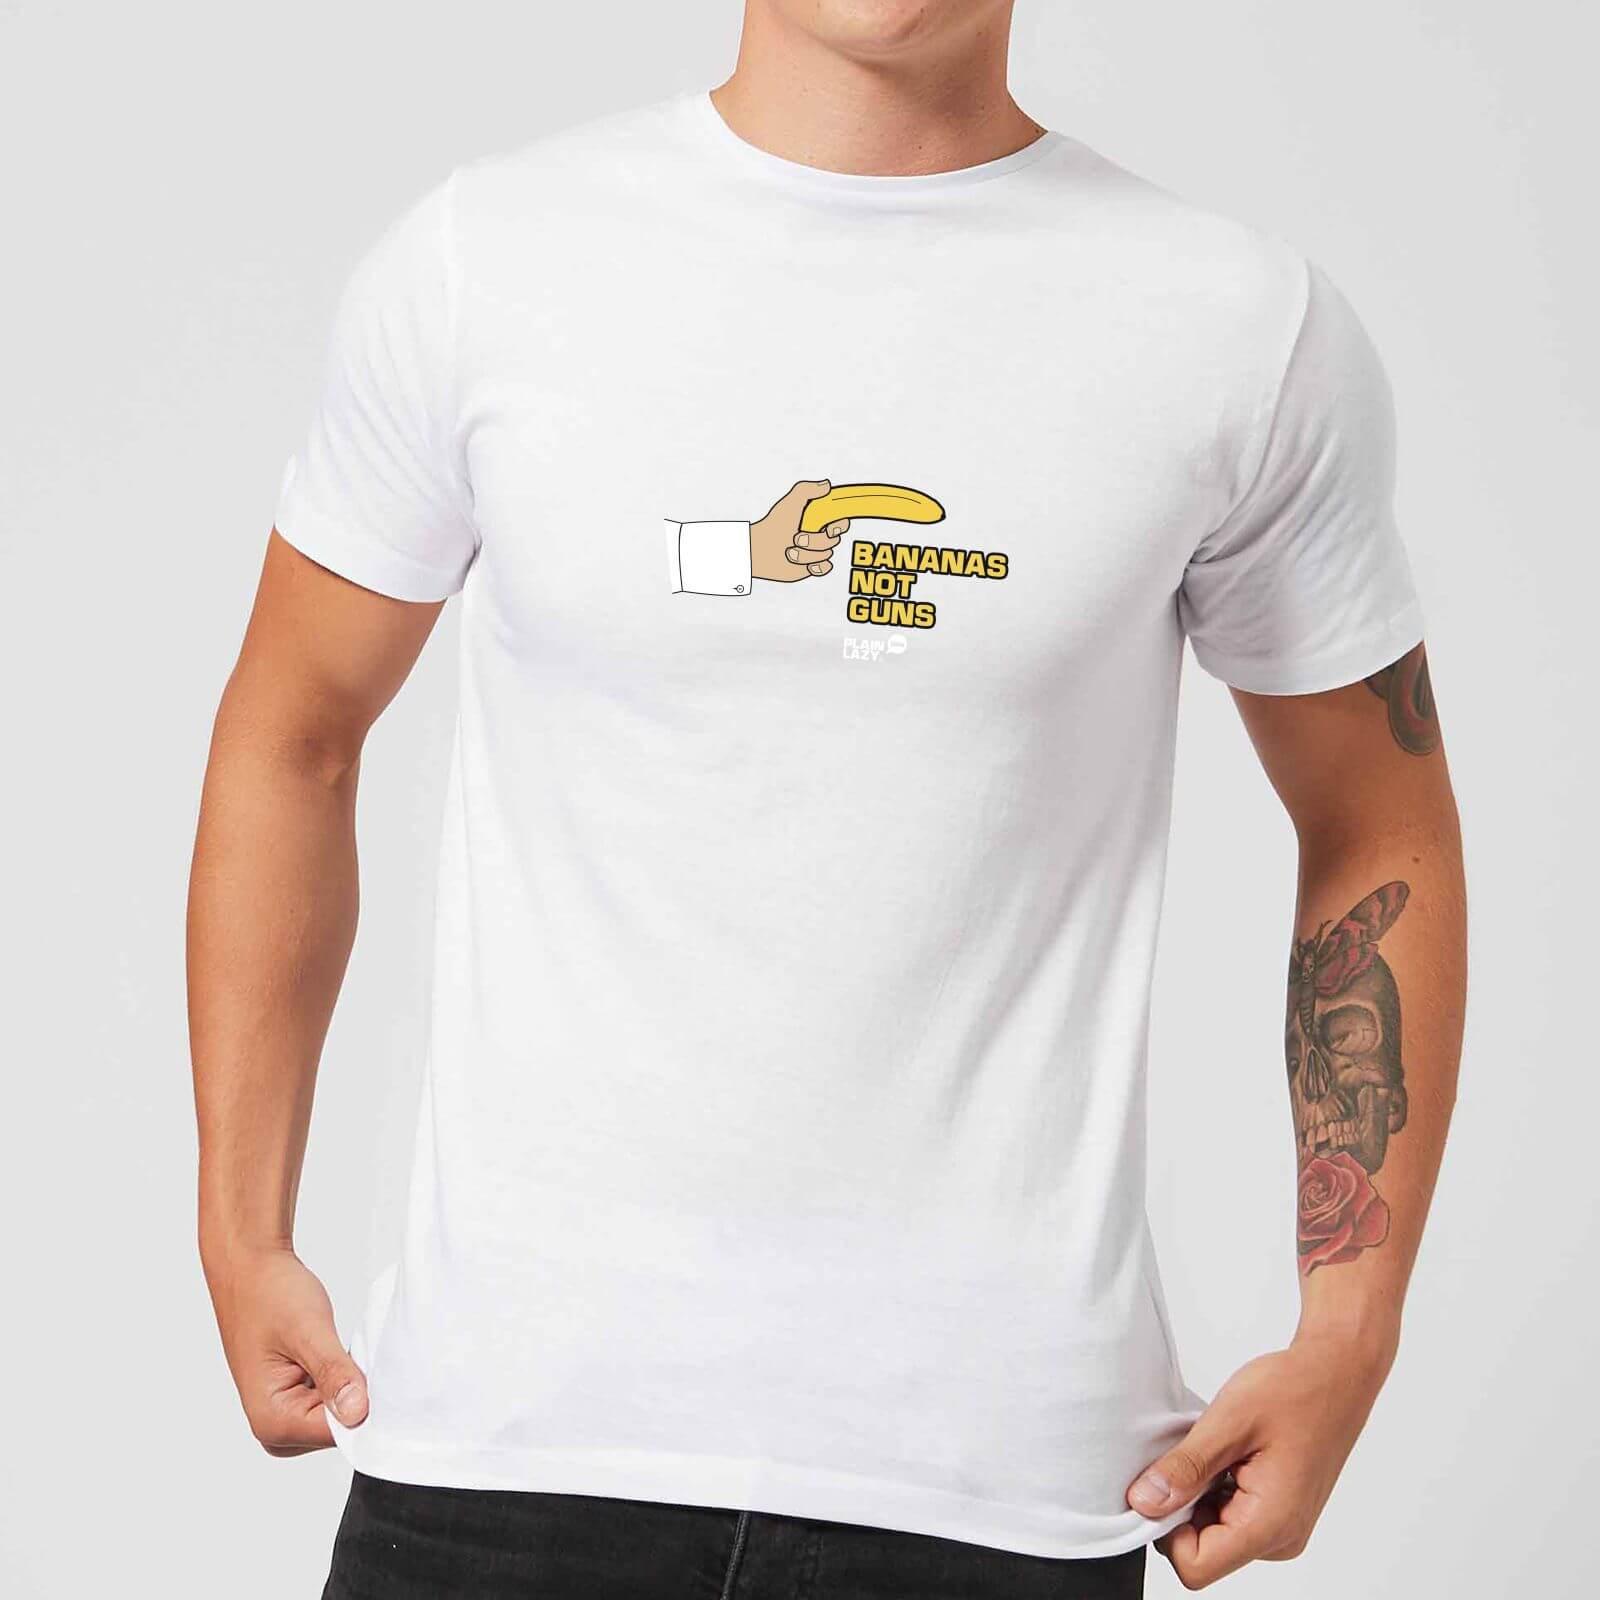 Plain Lazy Bananas Not Guns Men's T-Shirt - White - XS - White